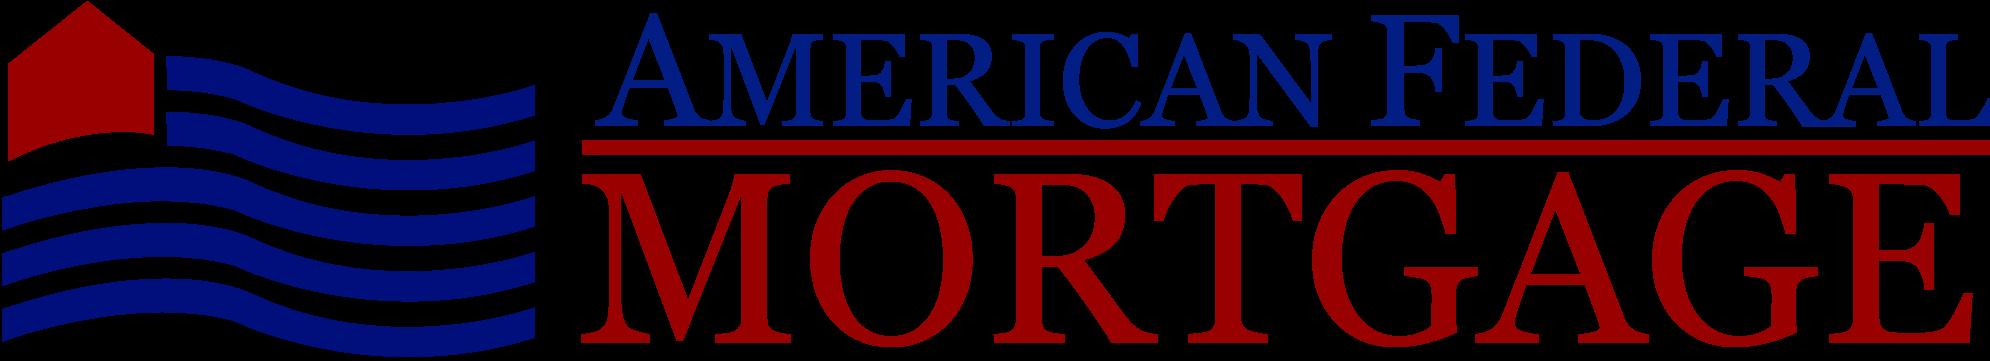 American Federal Mortgage logo